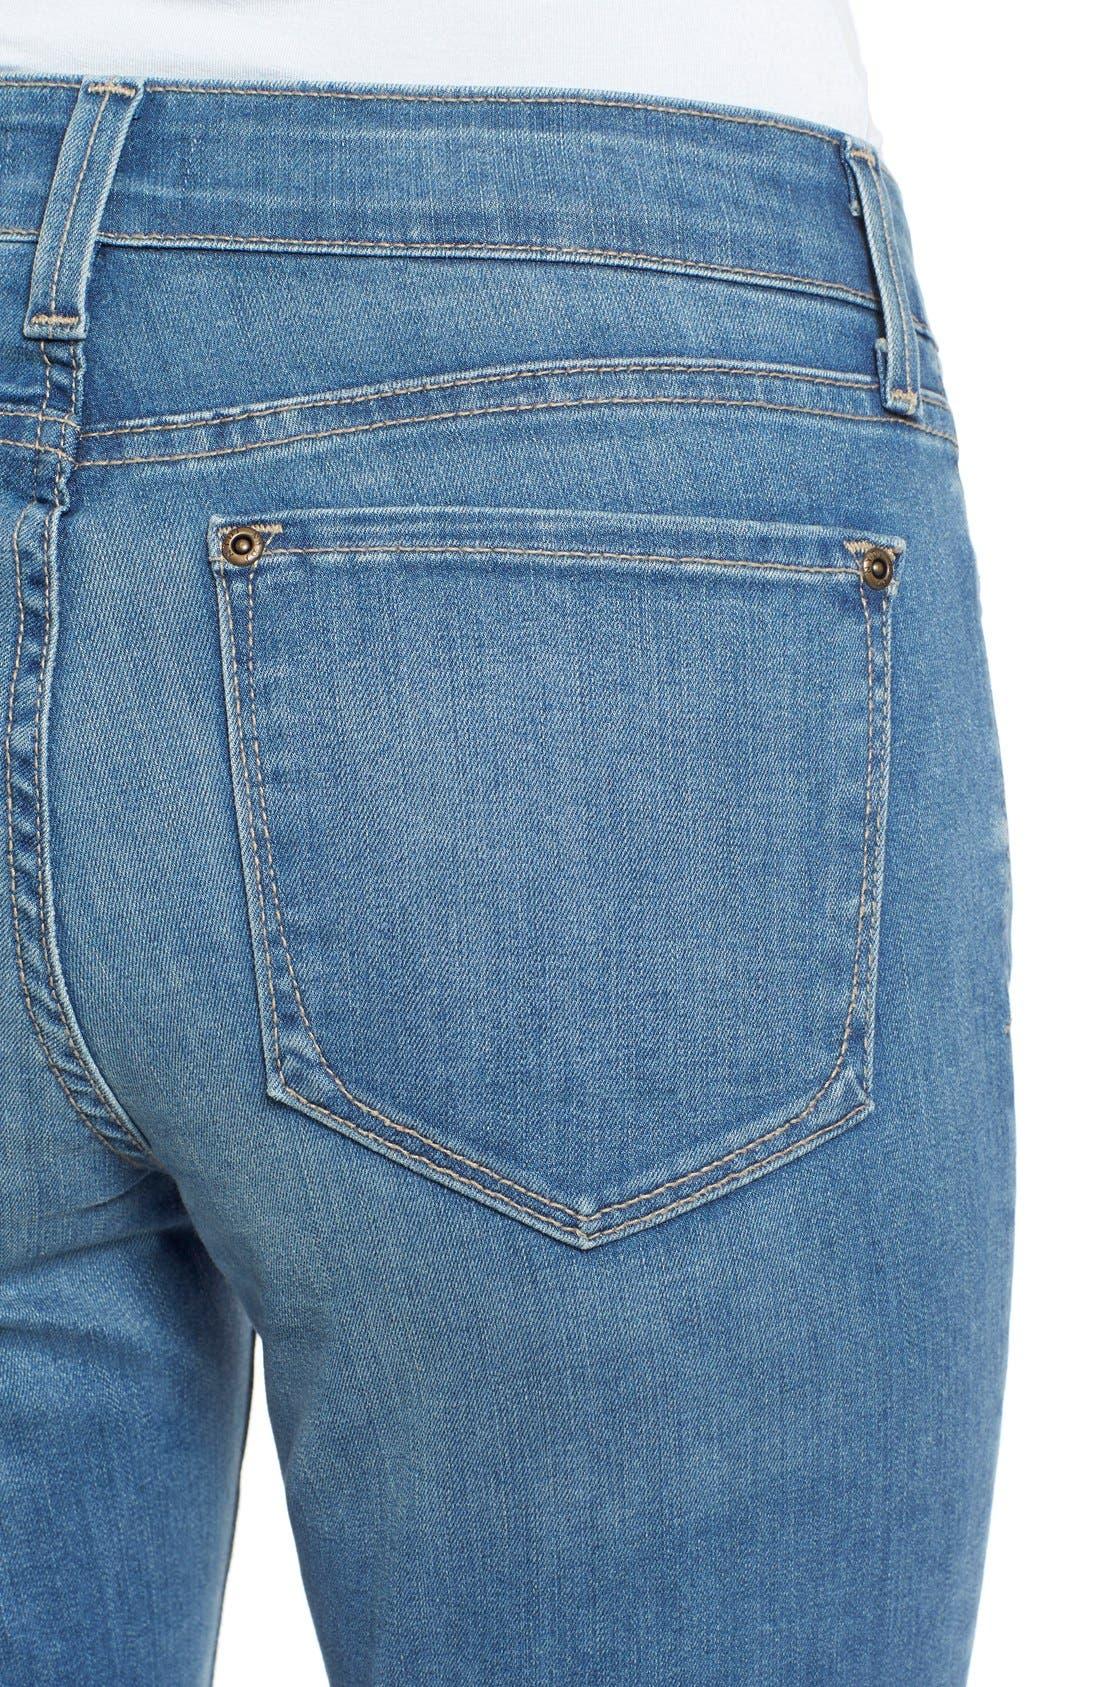 Alternate Image 4  - NYDJ 'Anabelle' Stretch Skinny Boyfriend Jeans (Upper Falls) (Regular & Petite)